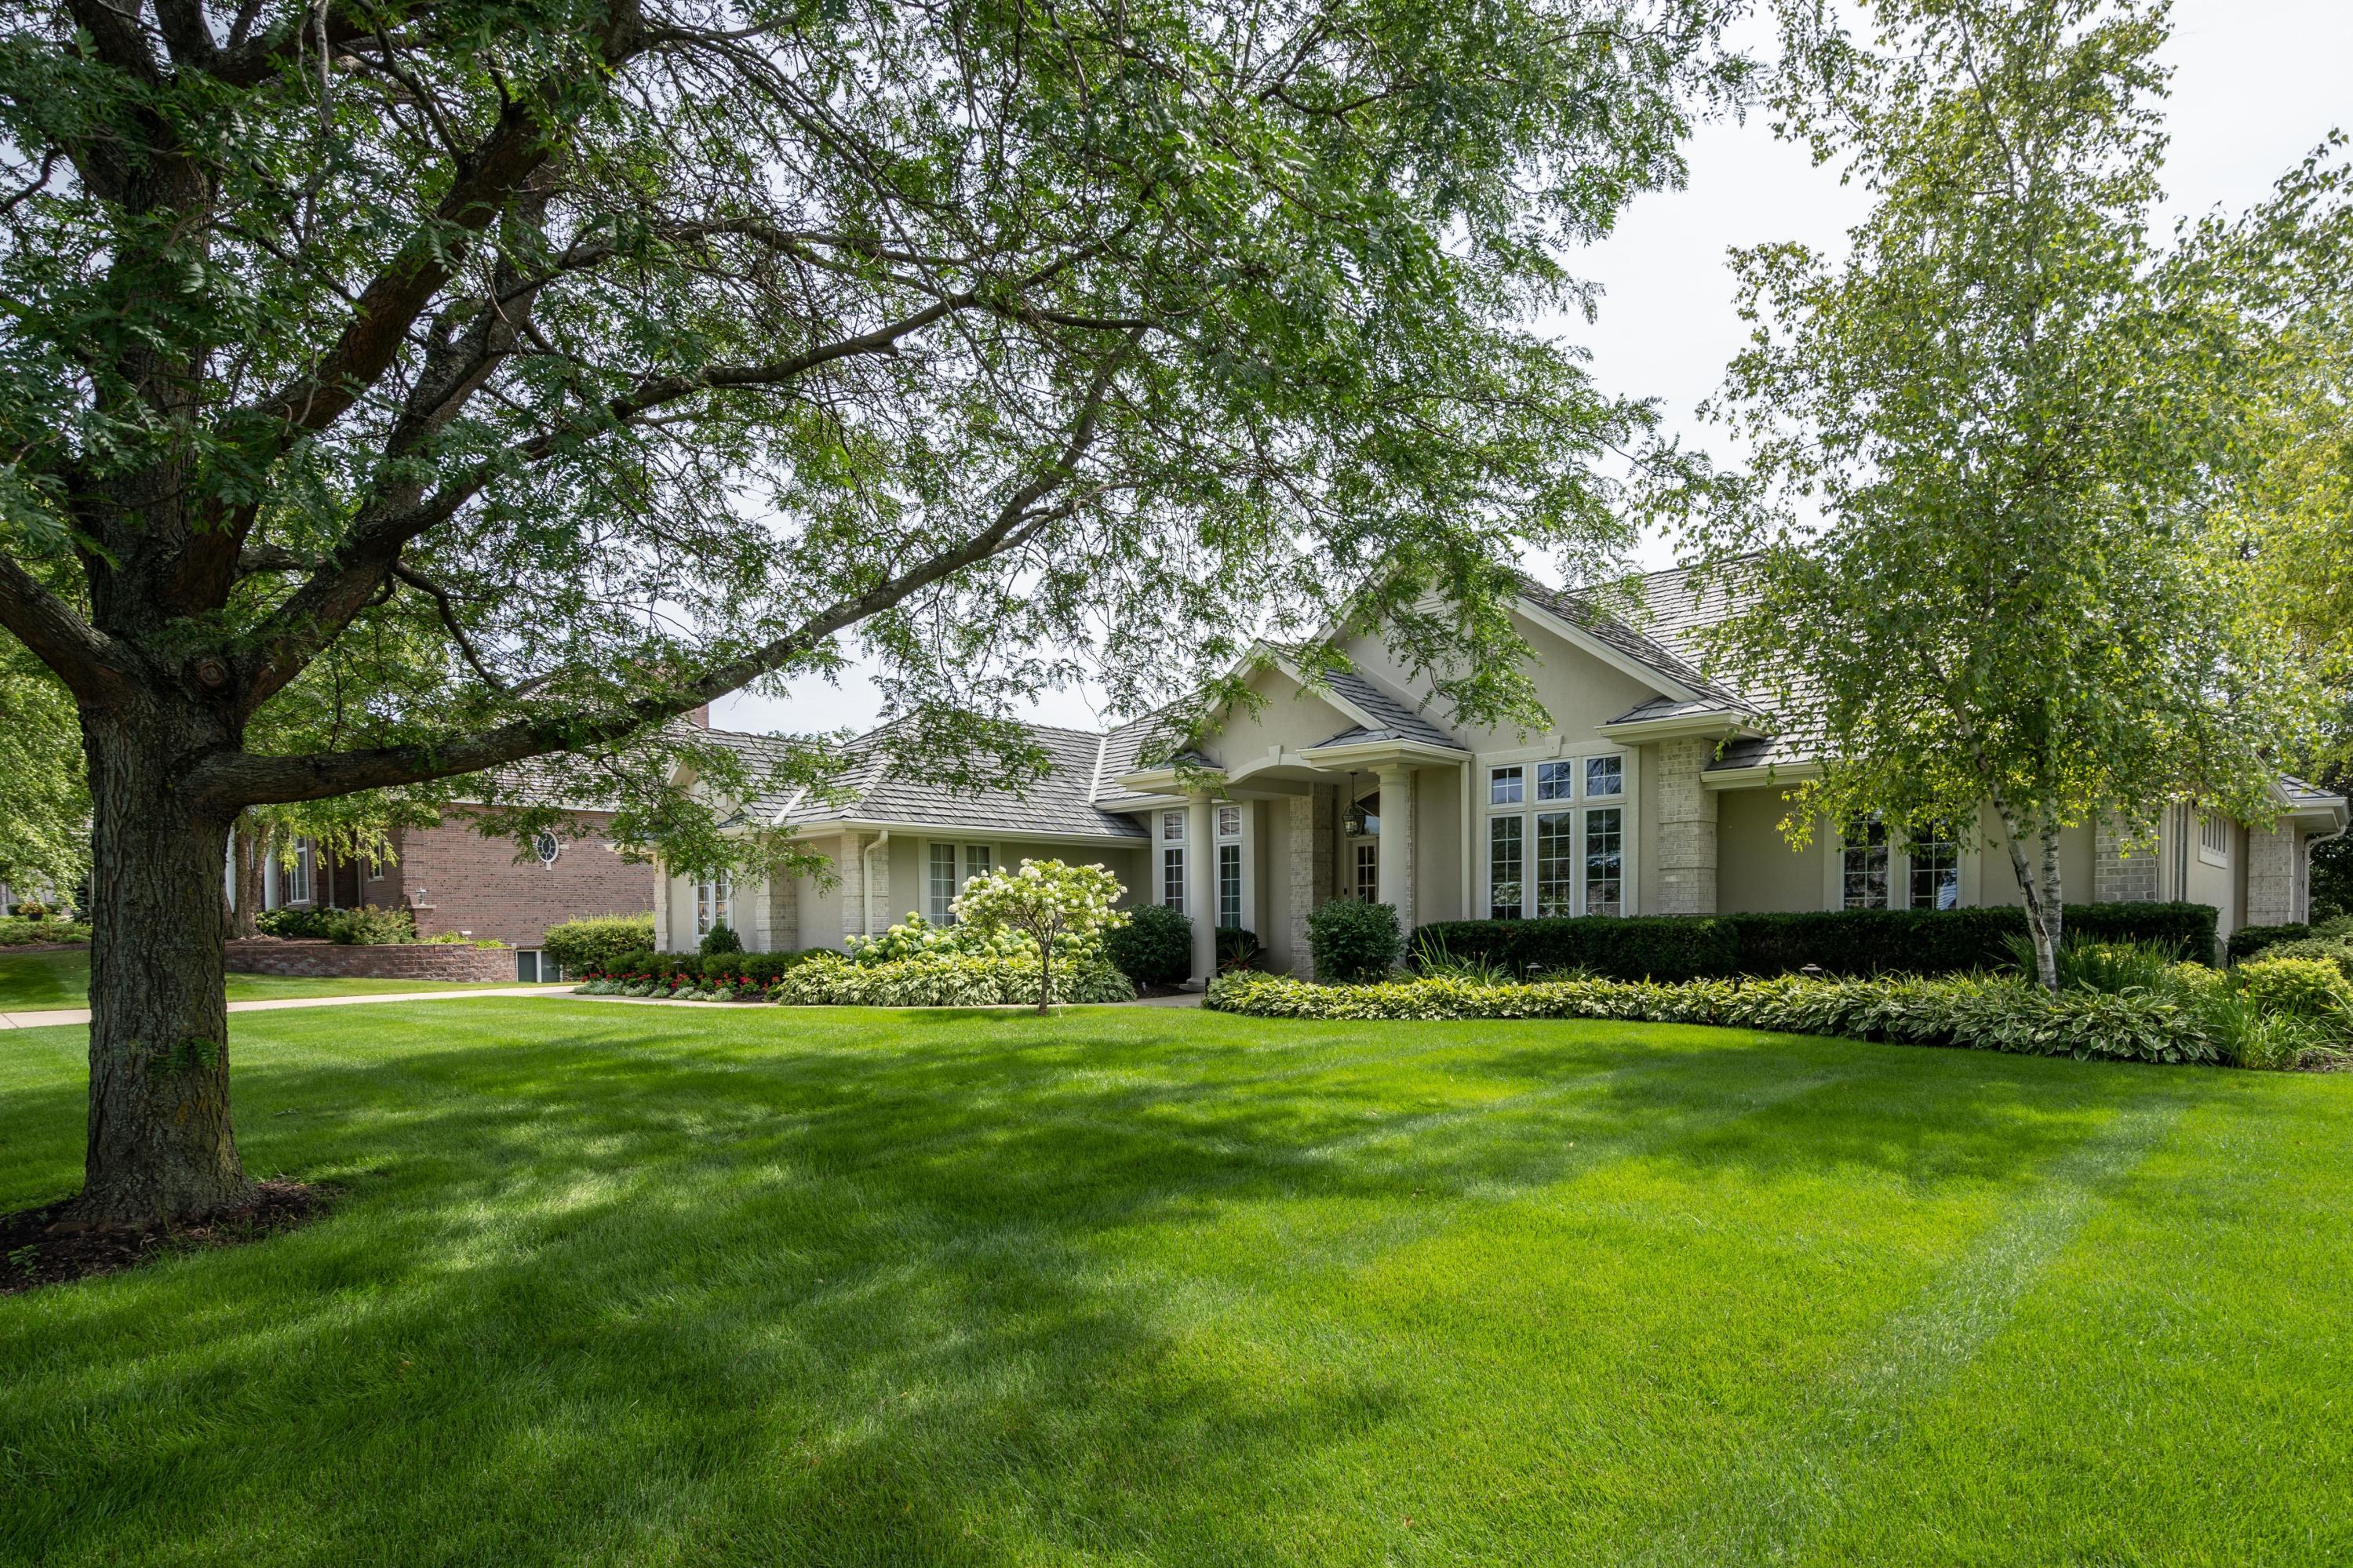 1605 Bristlecone Dr, Hartland, Wisconsin 53029, 4 Bedrooms Bedrooms, 12 Rooms Rooms,3 BathroomsBathrooms,Single-Family,For Sale,Bristlecone Dr,1758152